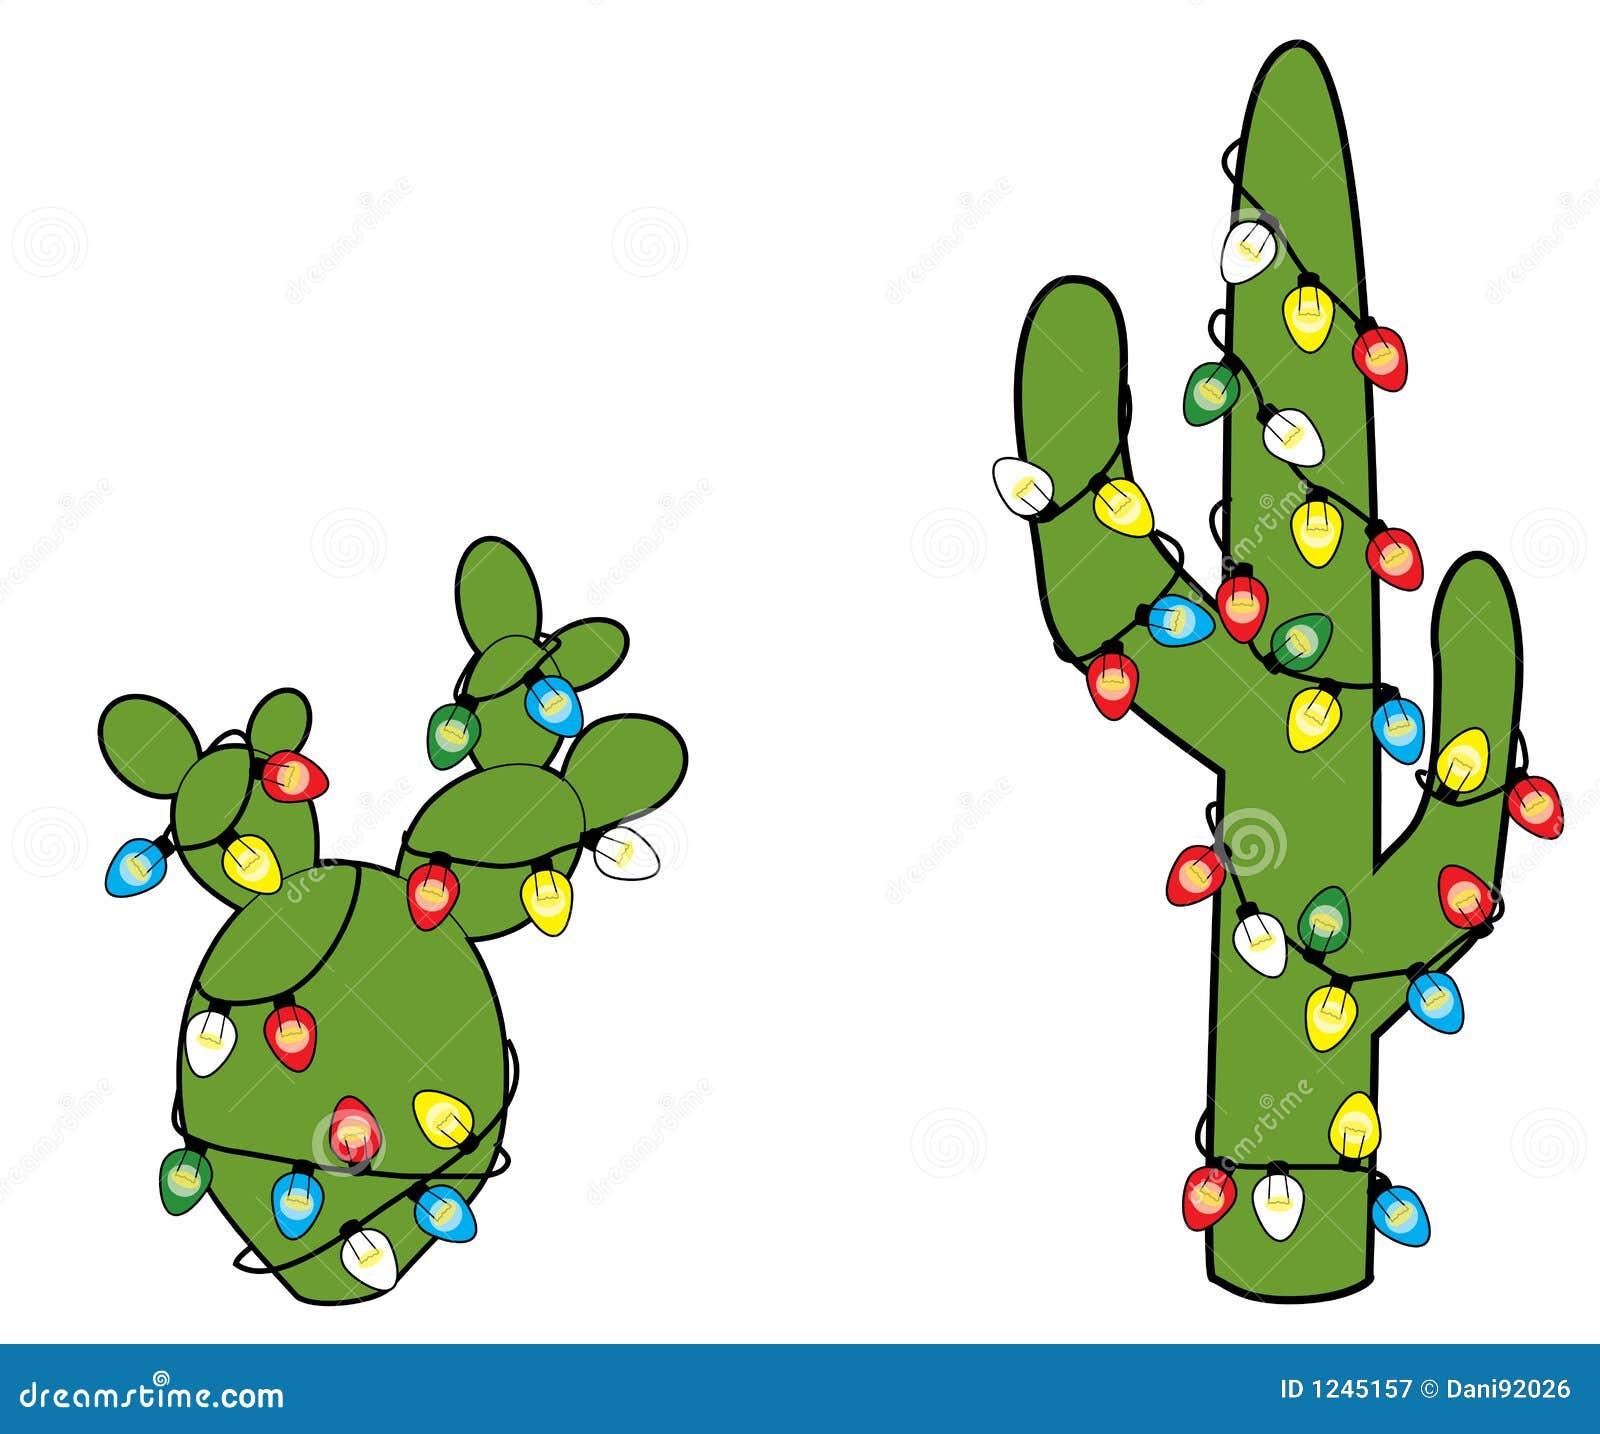 Christmas Cacti Royalty Free Stock Photography - Image: 1245157